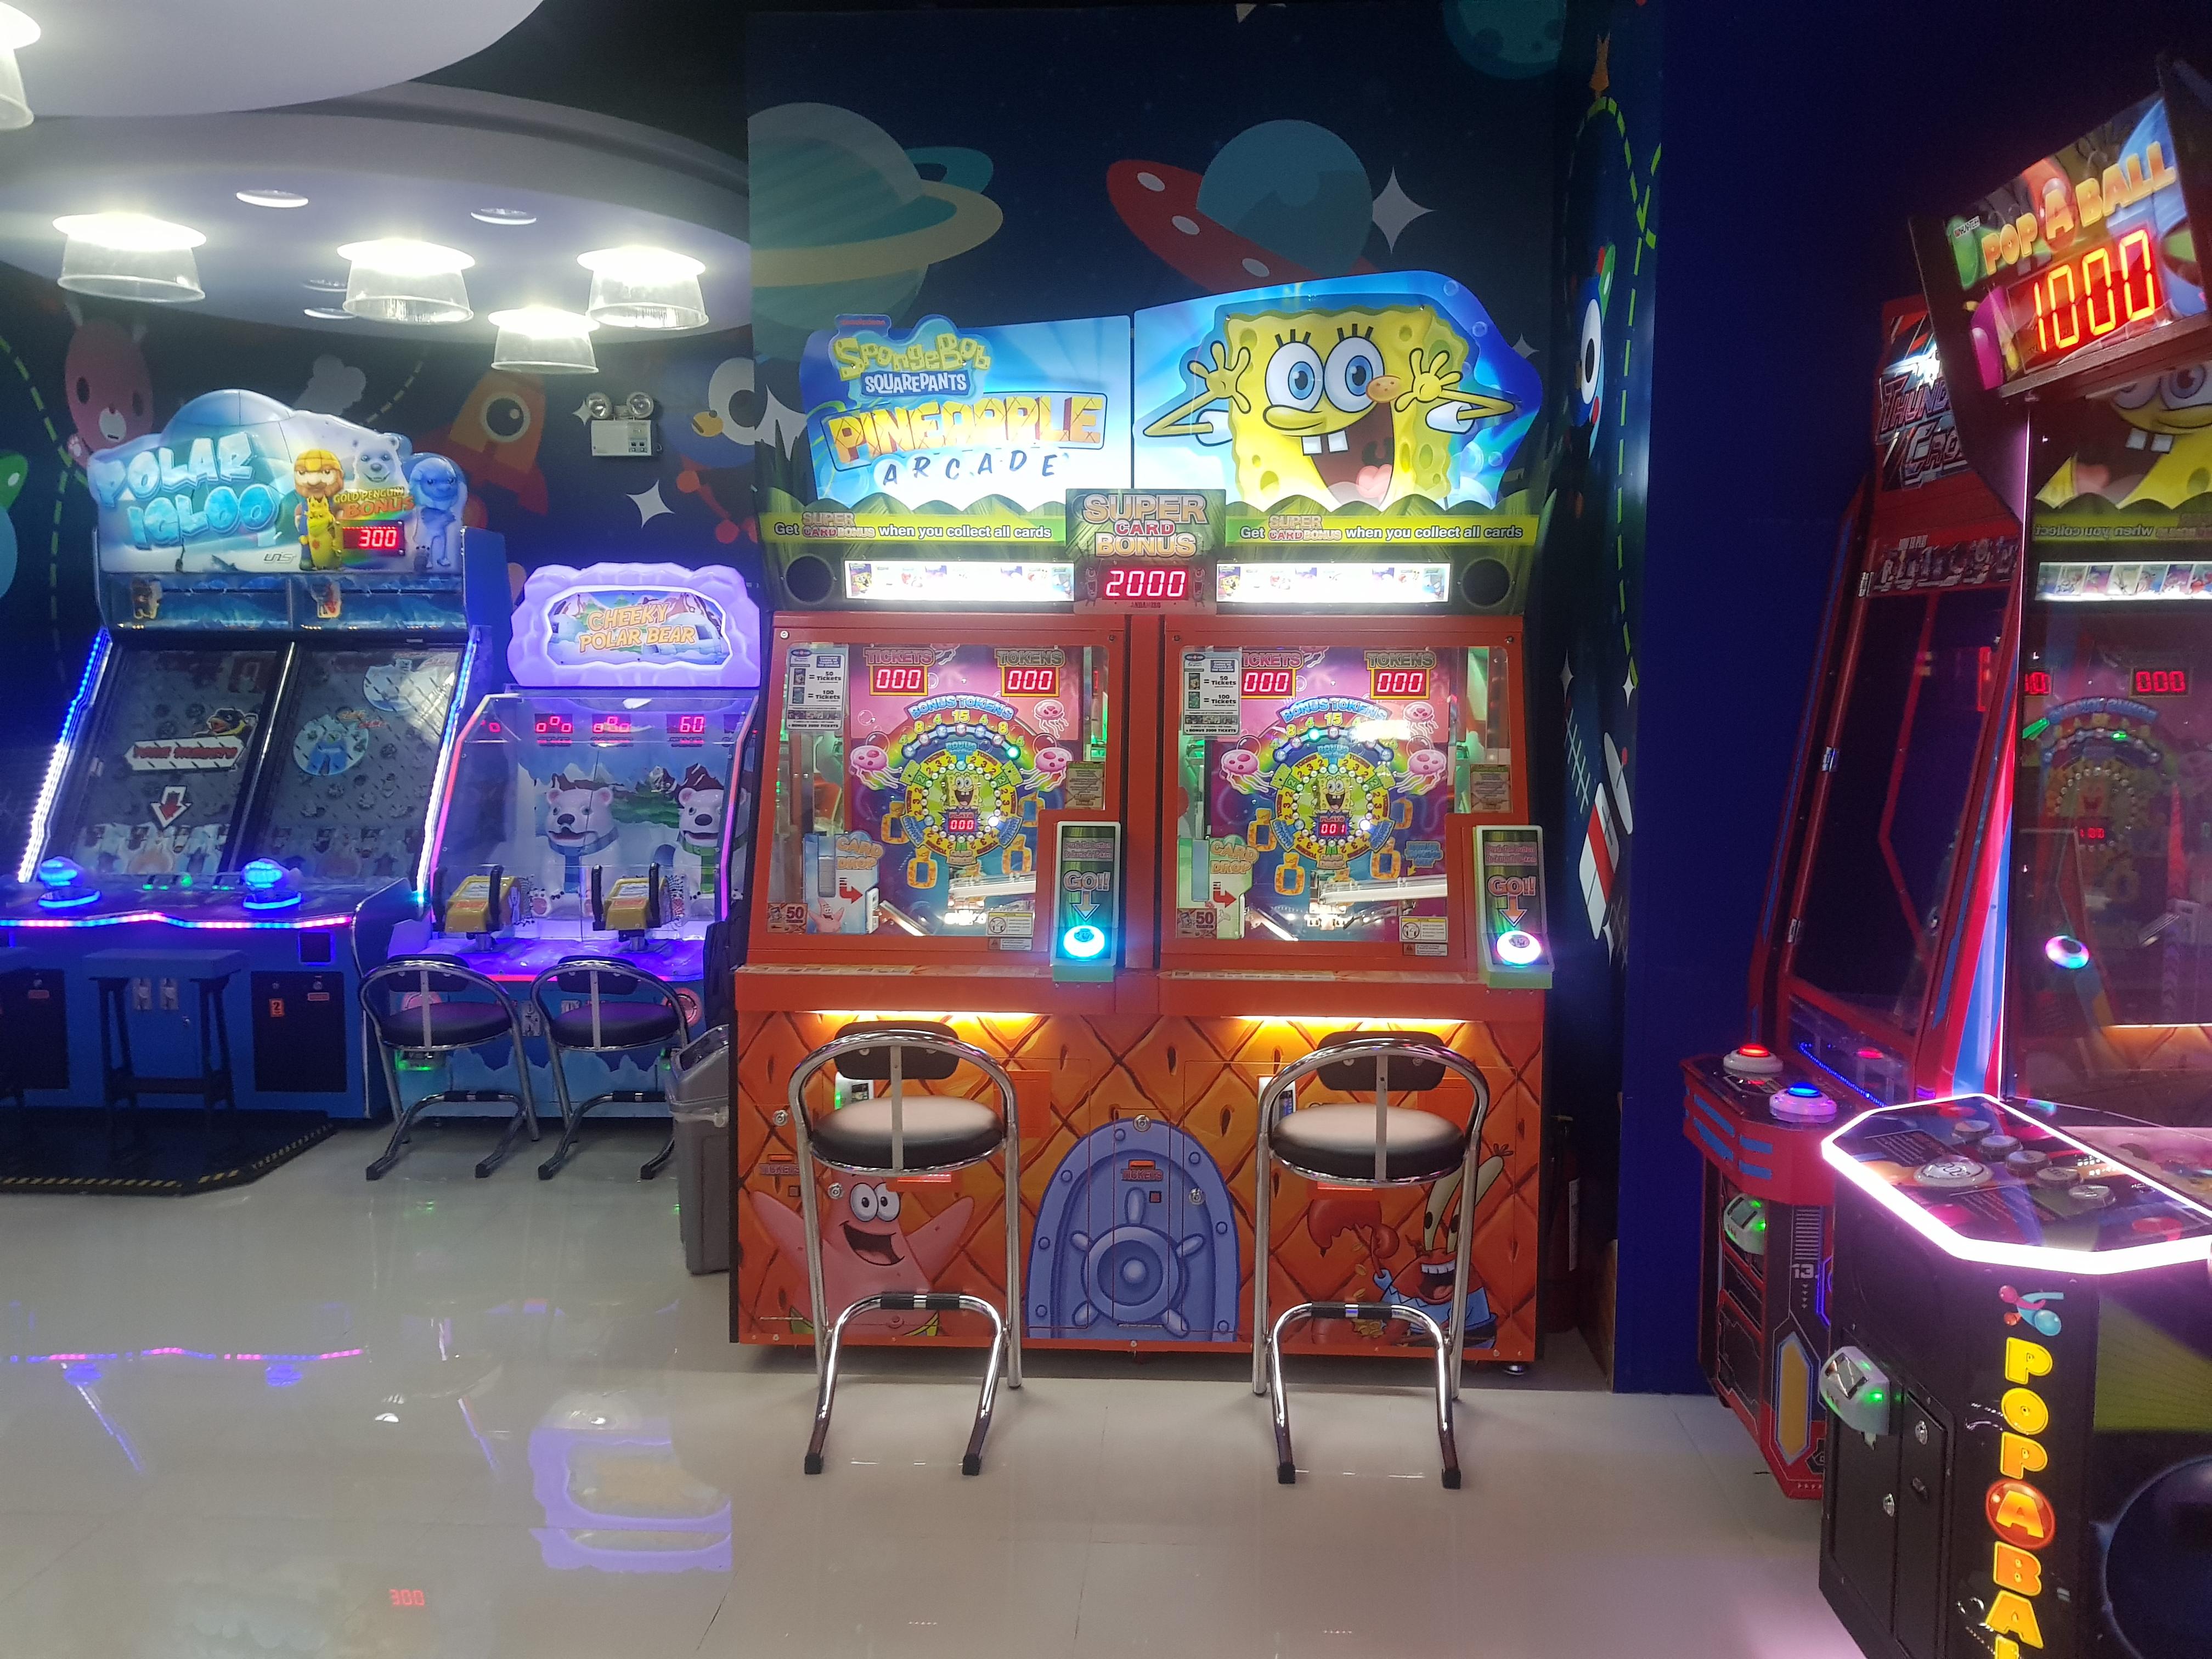 Spongebob coin pusher in QPS Santolan - Arcade Locations